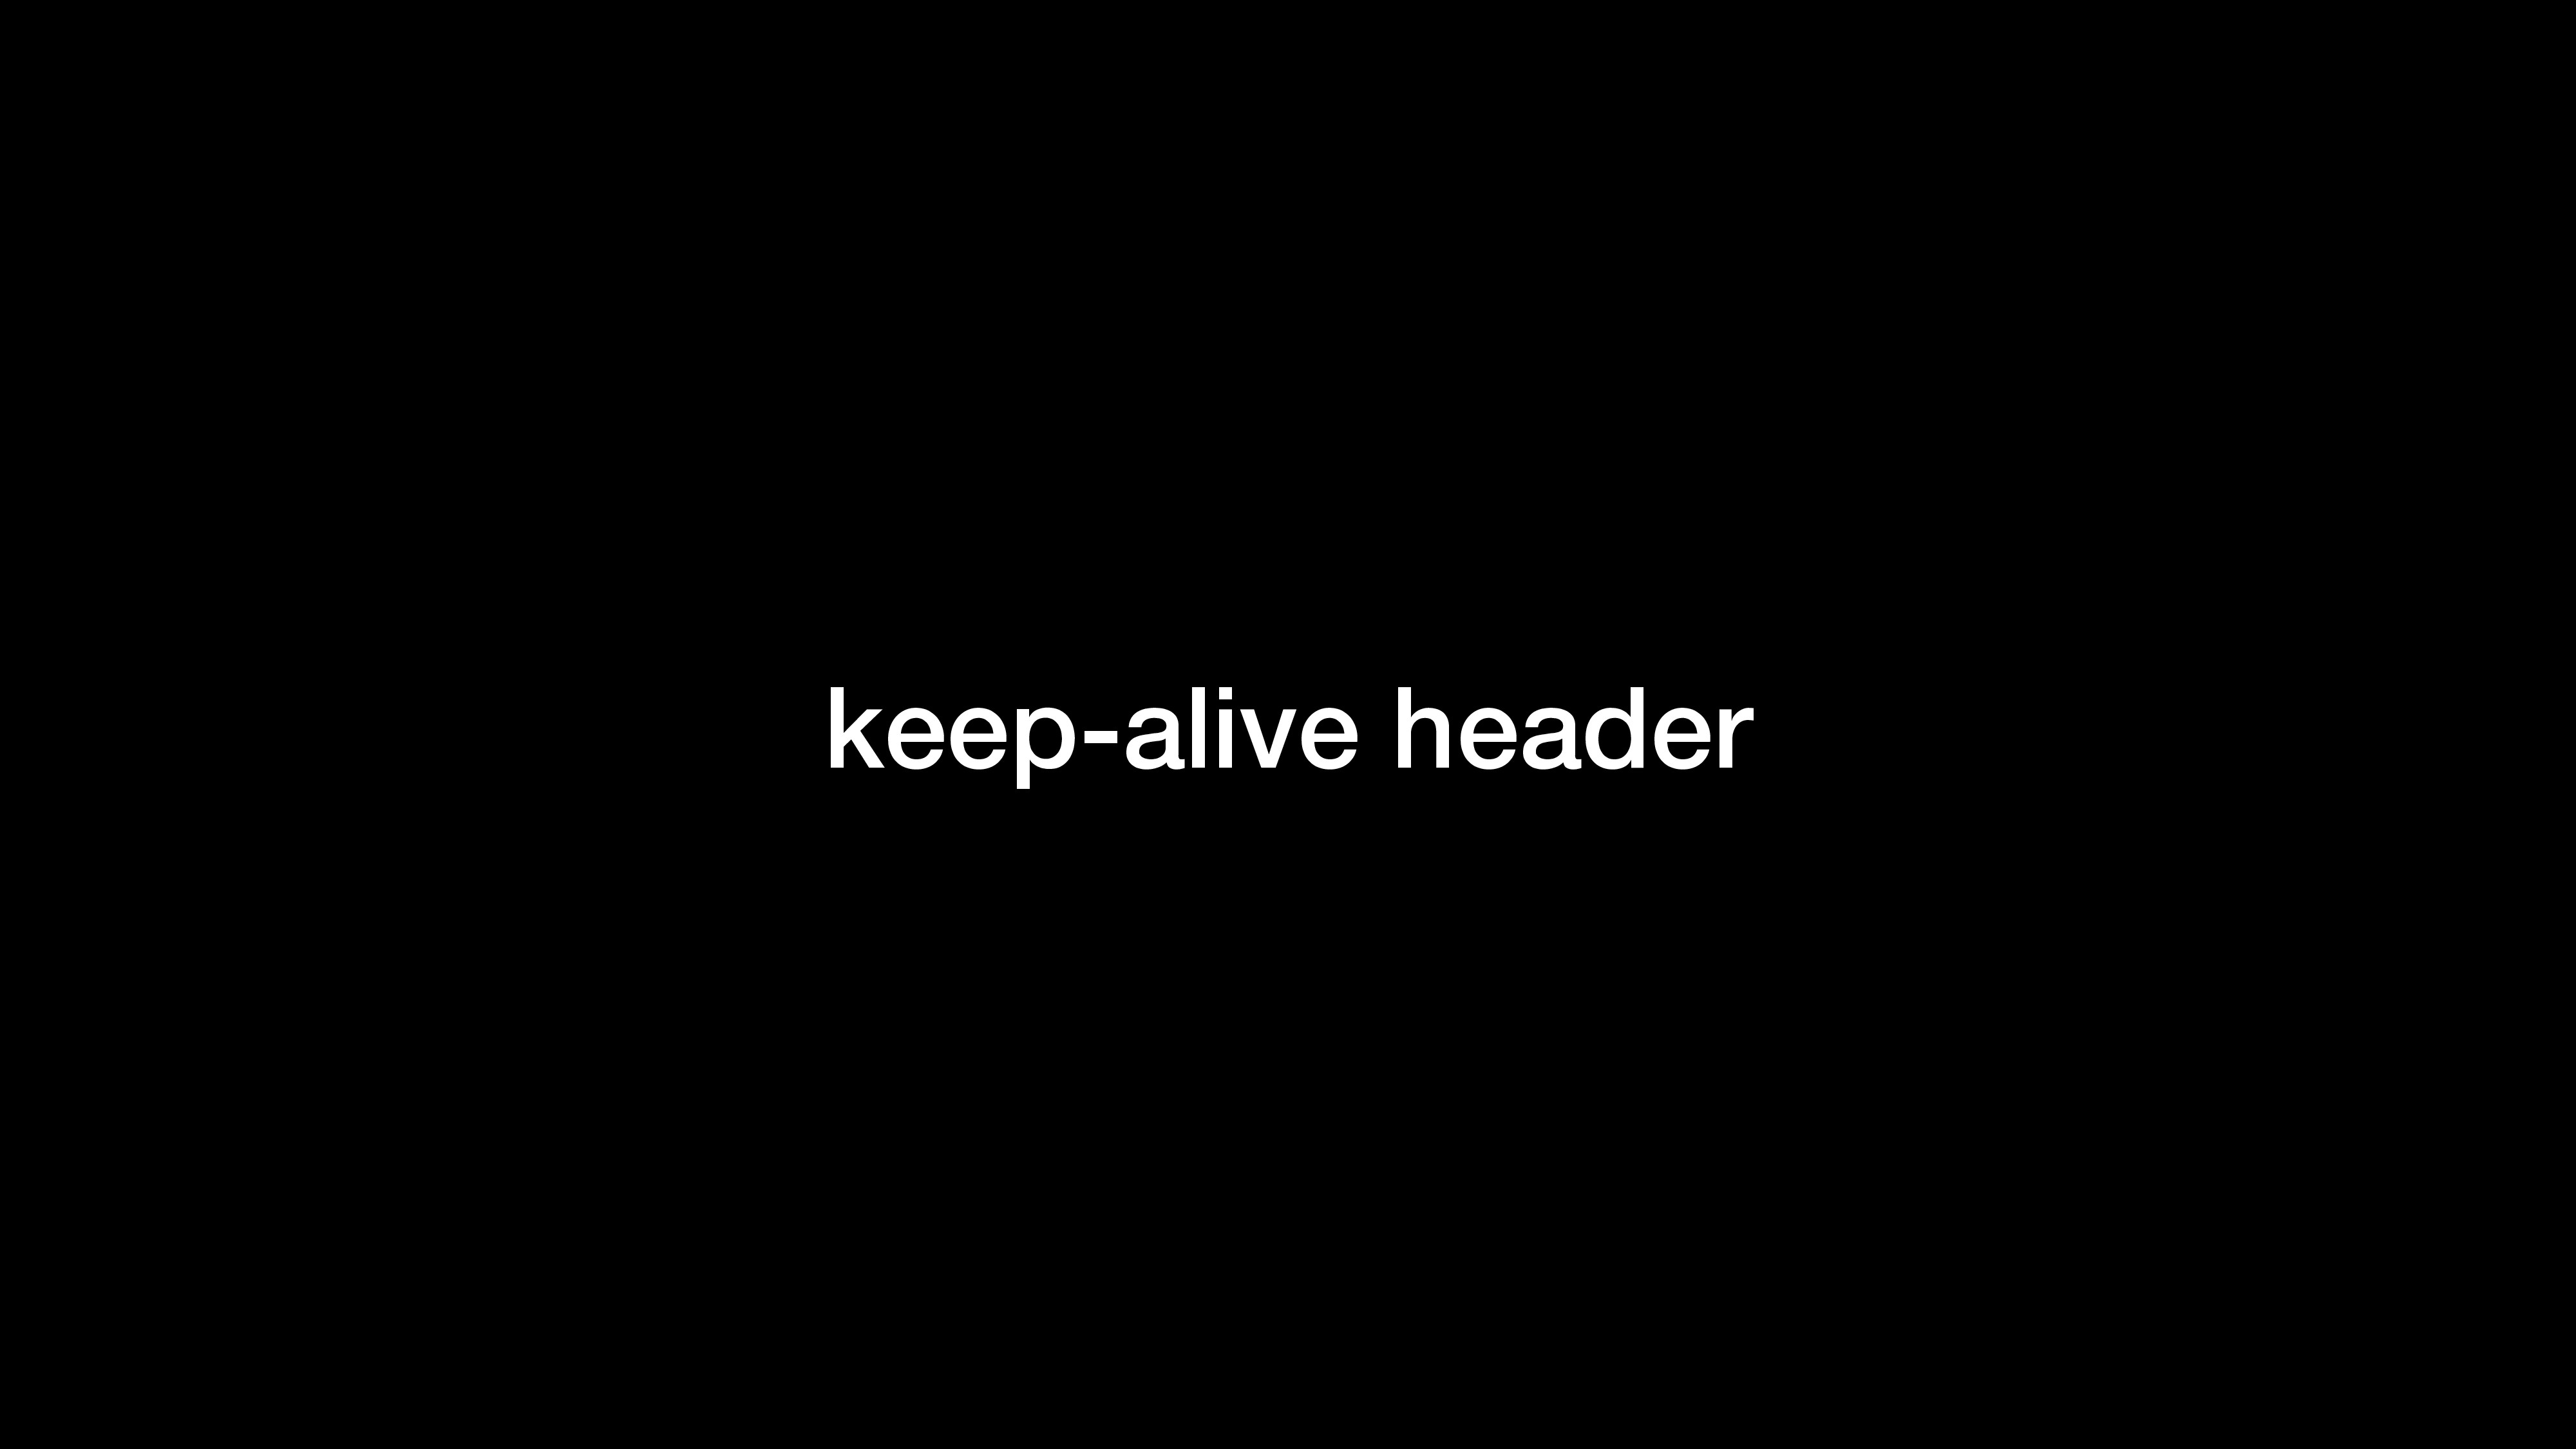 keep-alive header